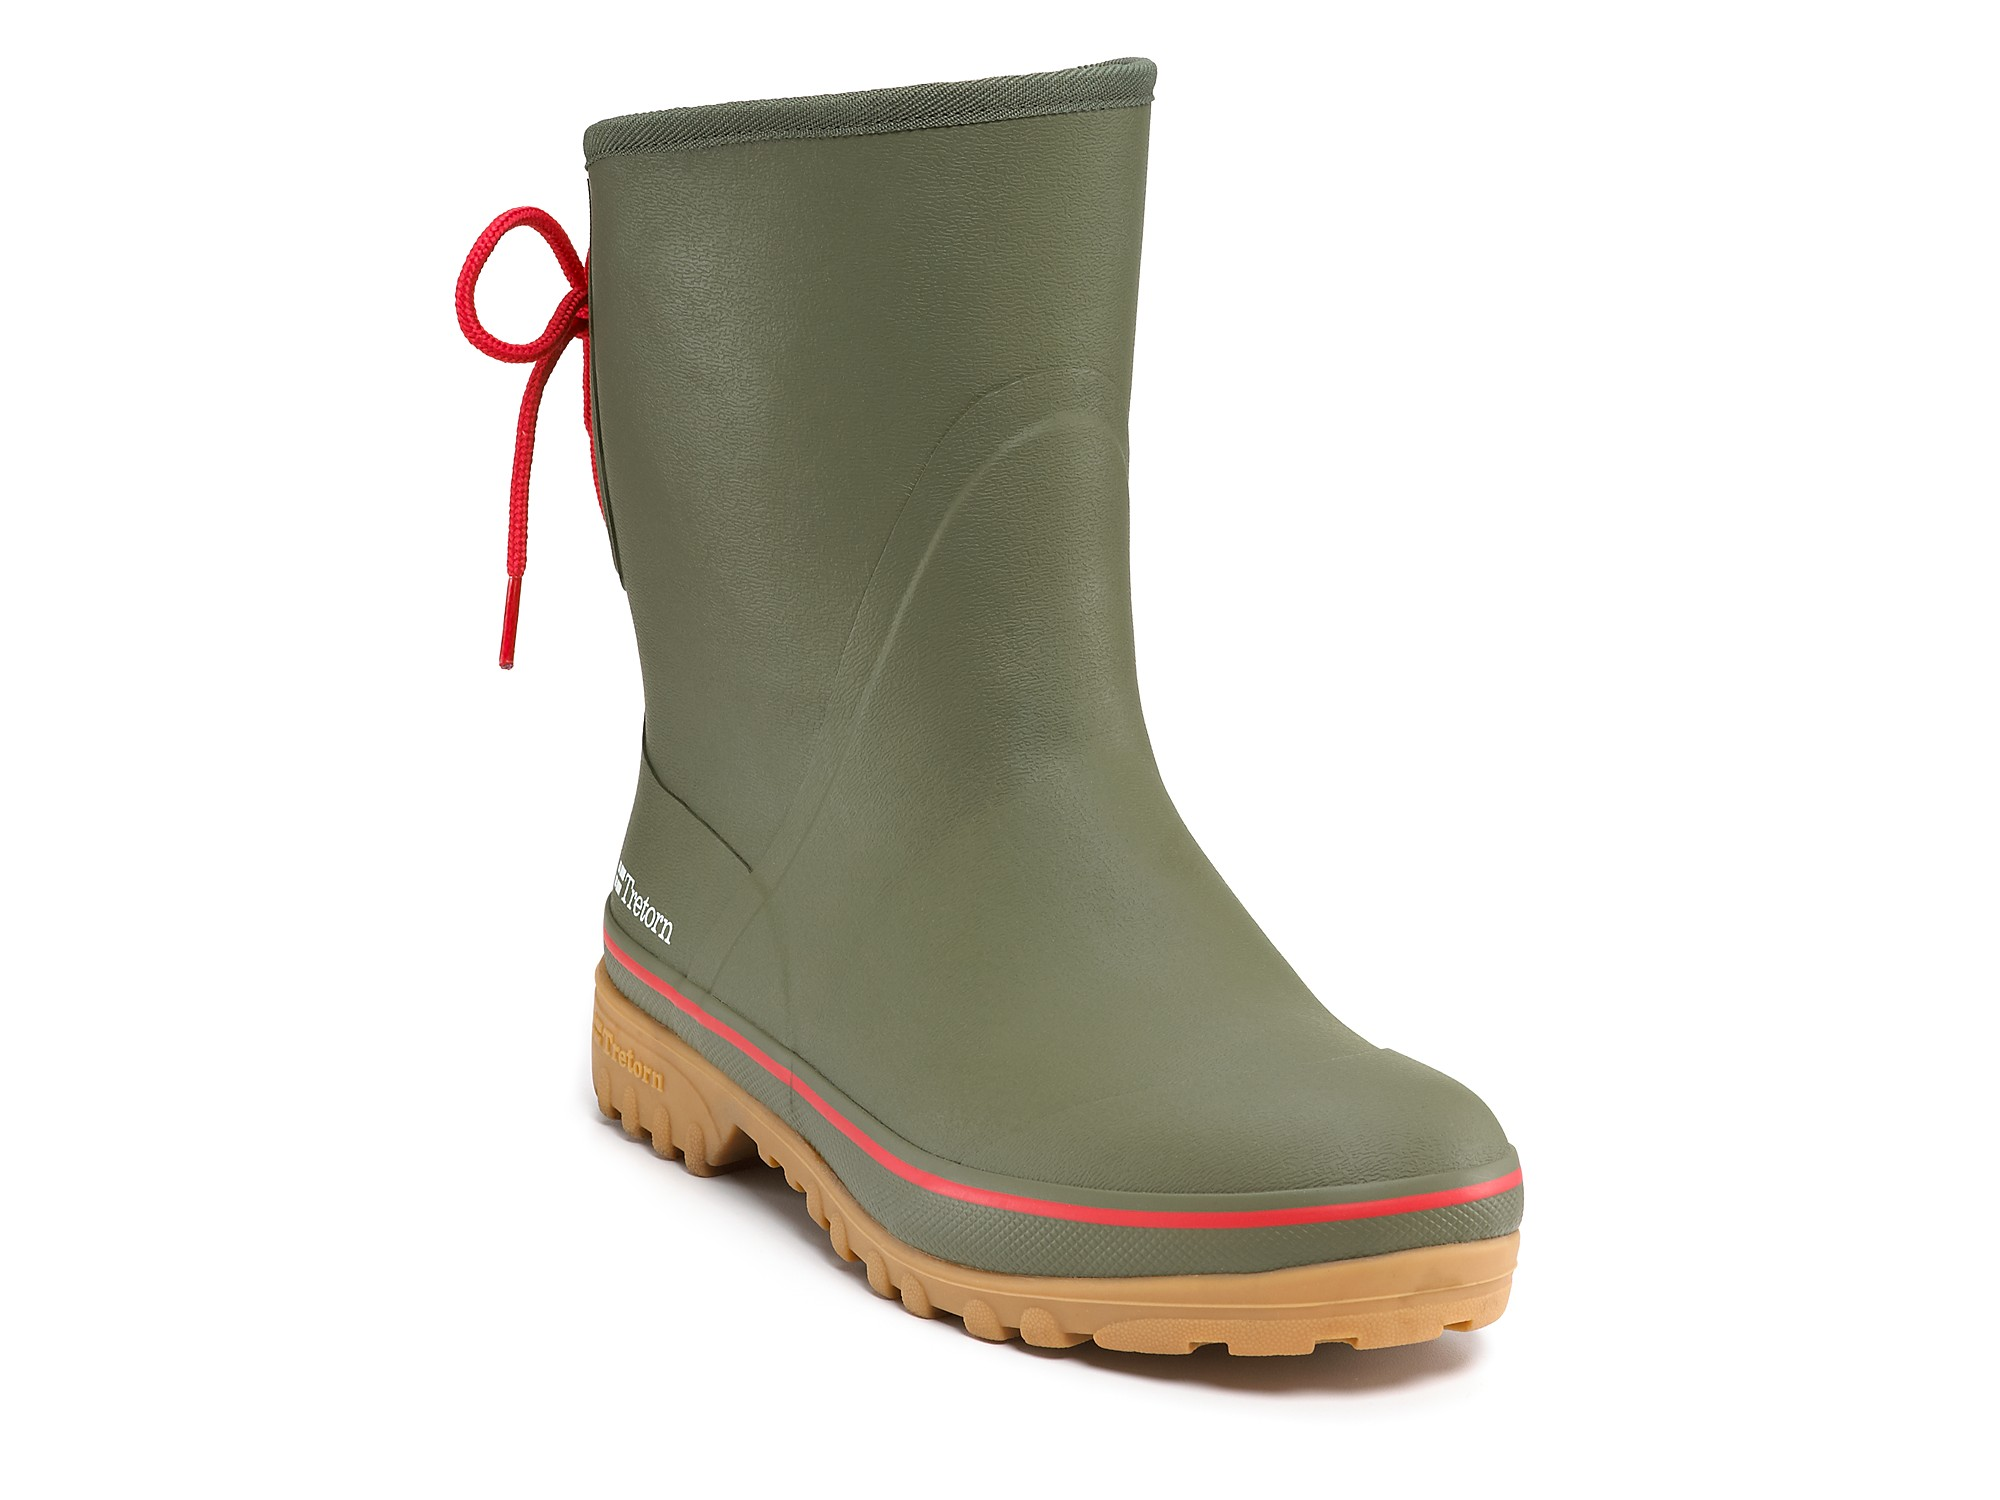 Tretorn Sub Rain Boots In Green For Men Olive Lyst